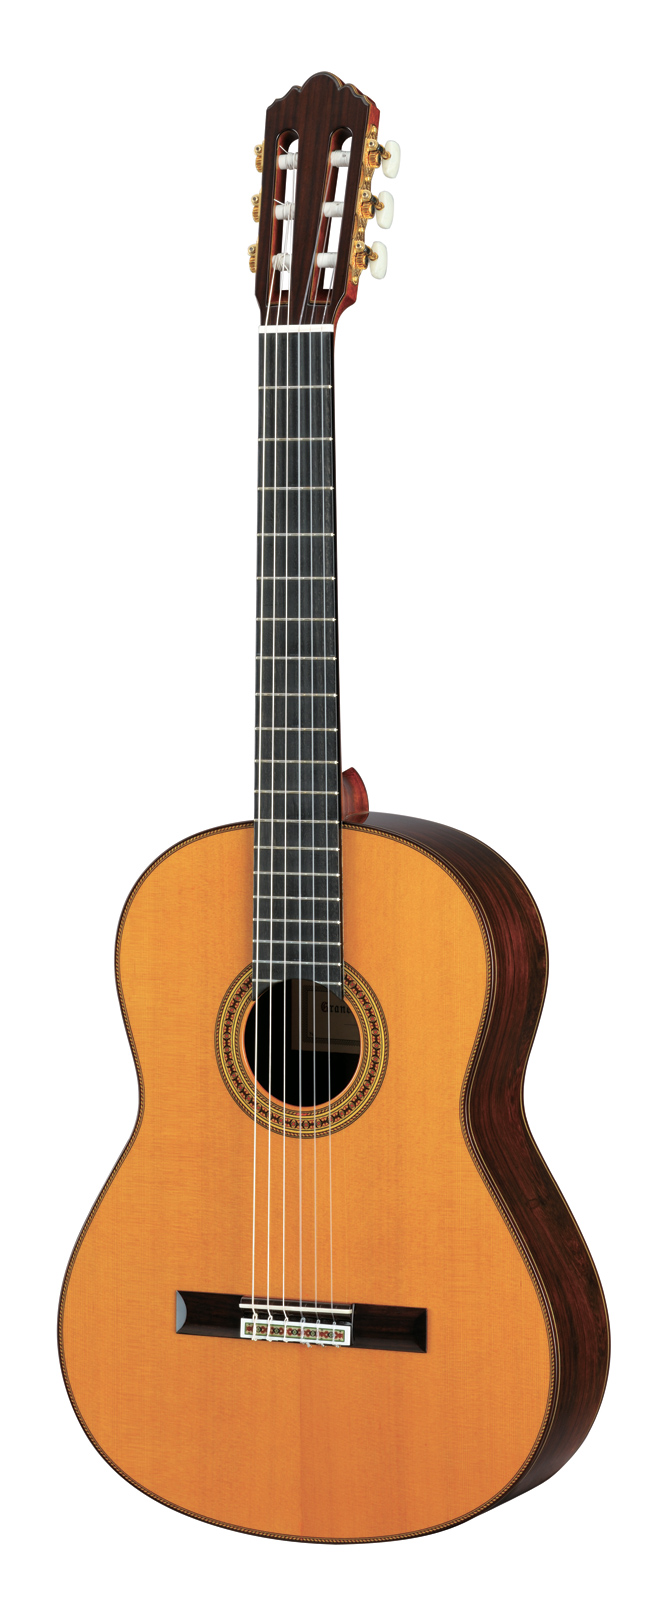 Buy Yamaha Classical Guitar Online